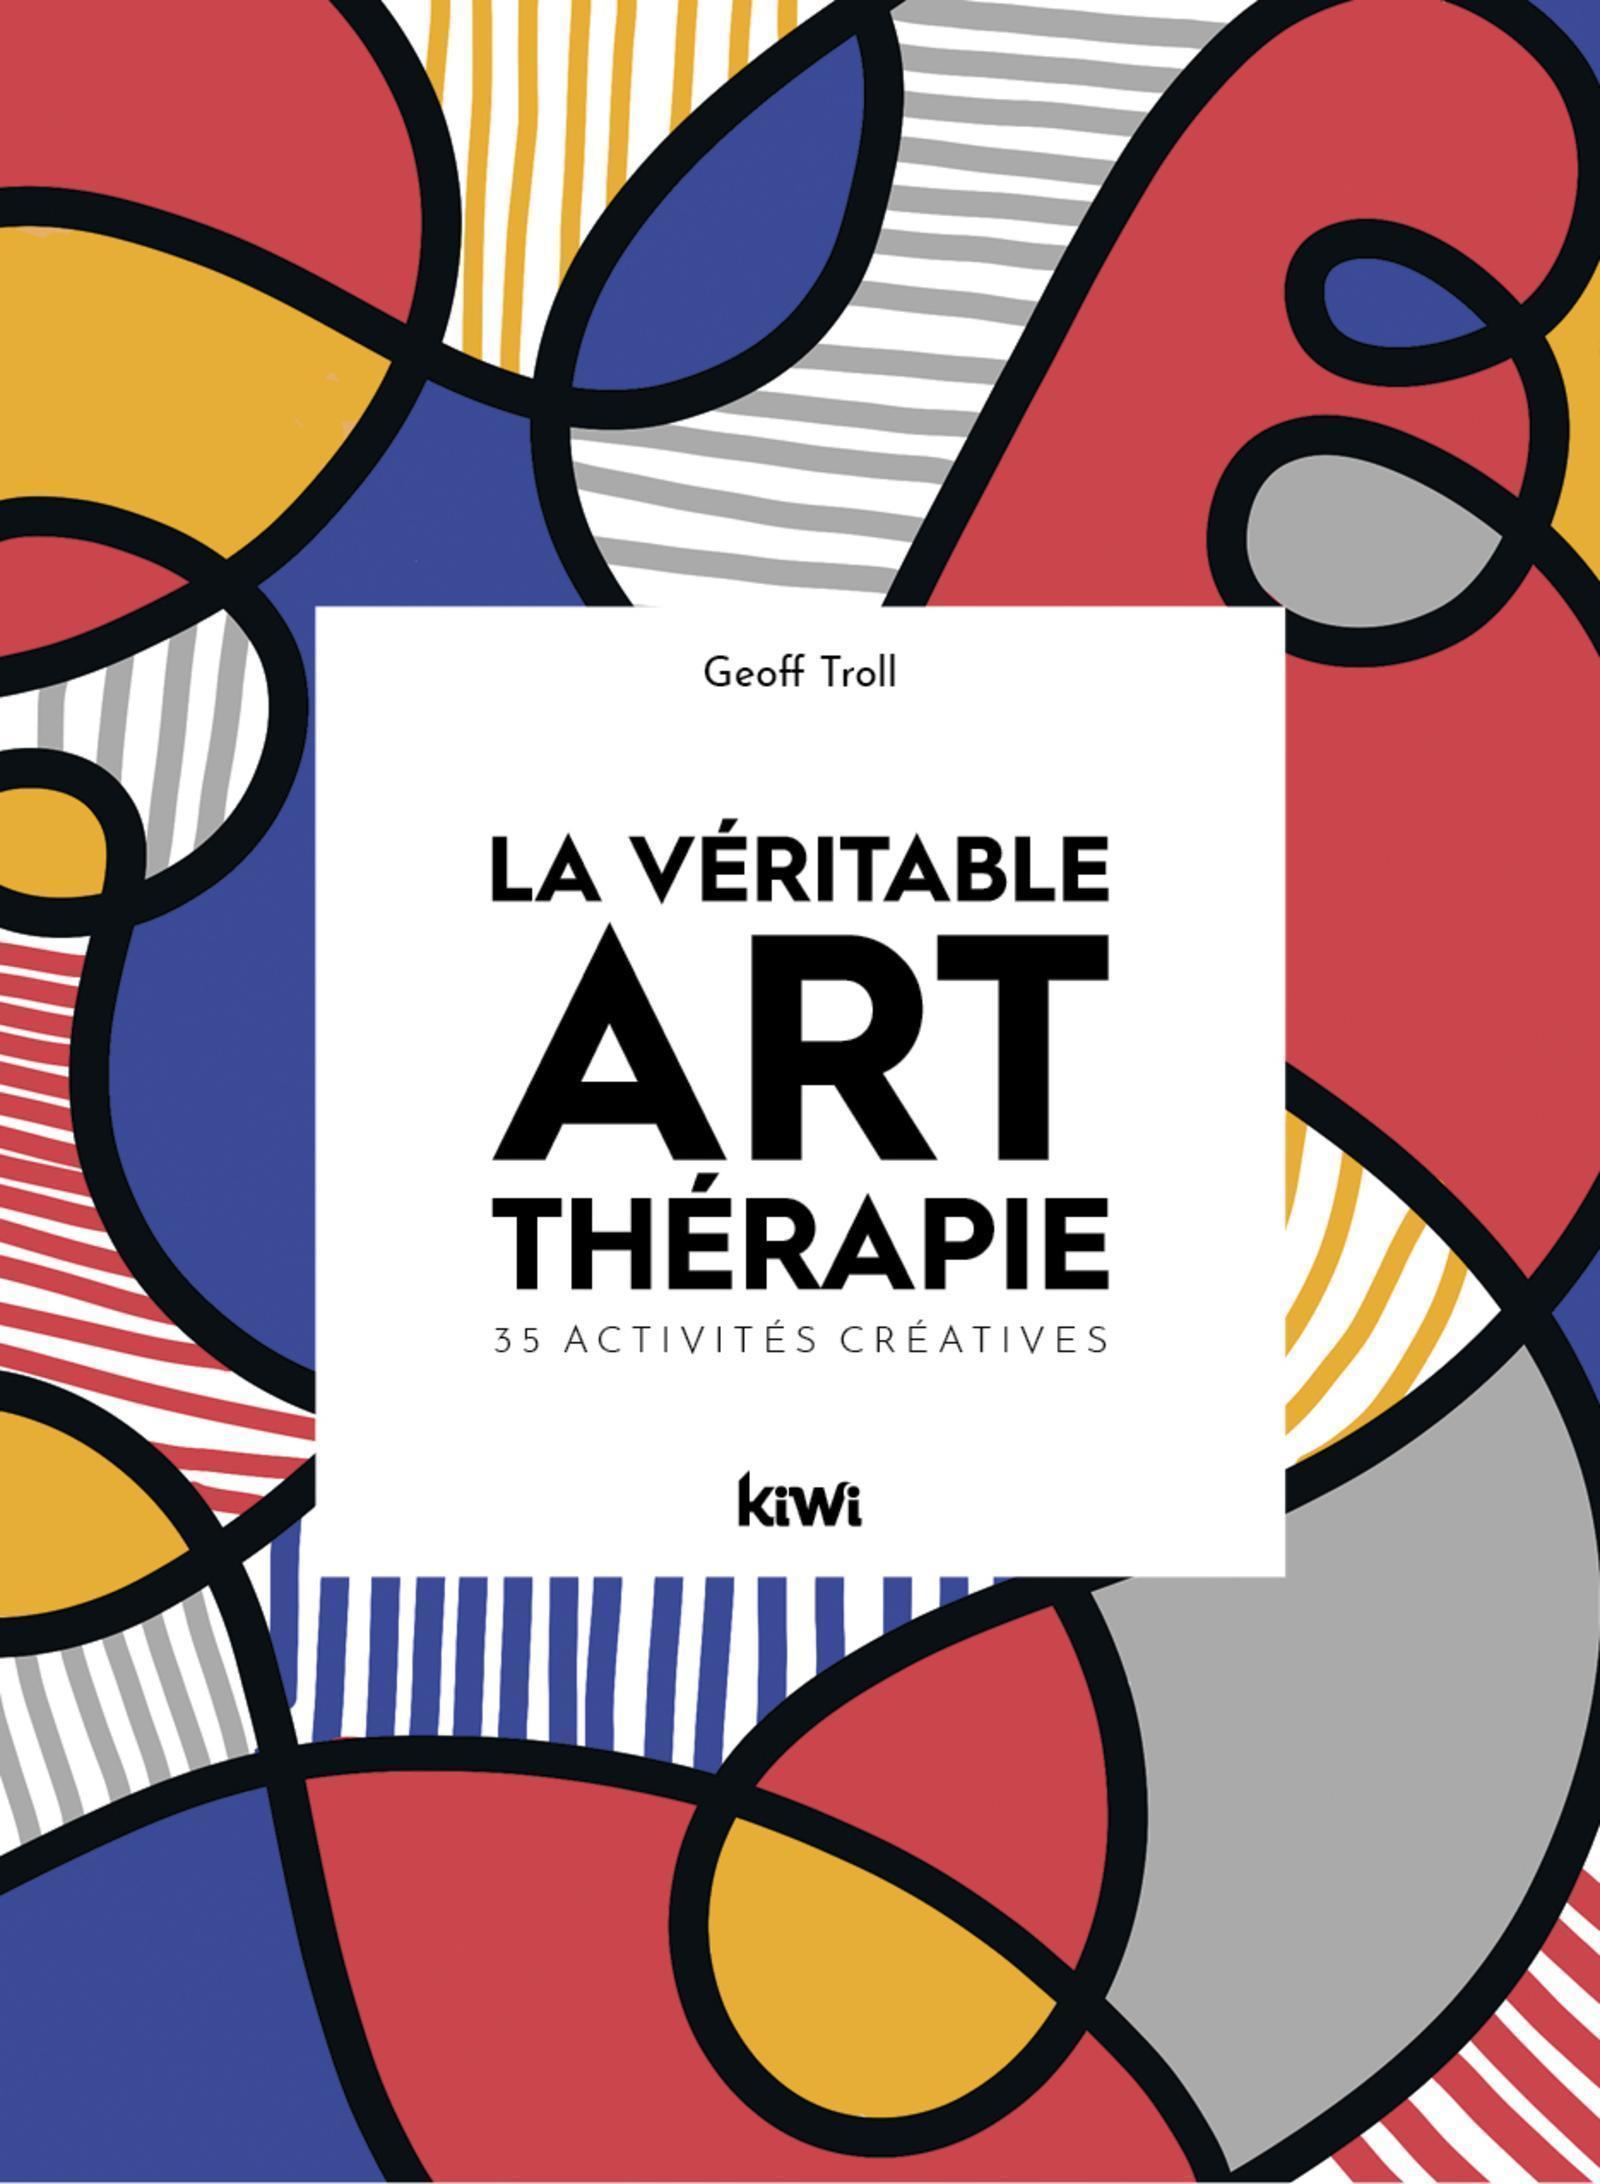 LA VERITABLE ART THERAPIE - 35 ACTIVITES CREATIVES